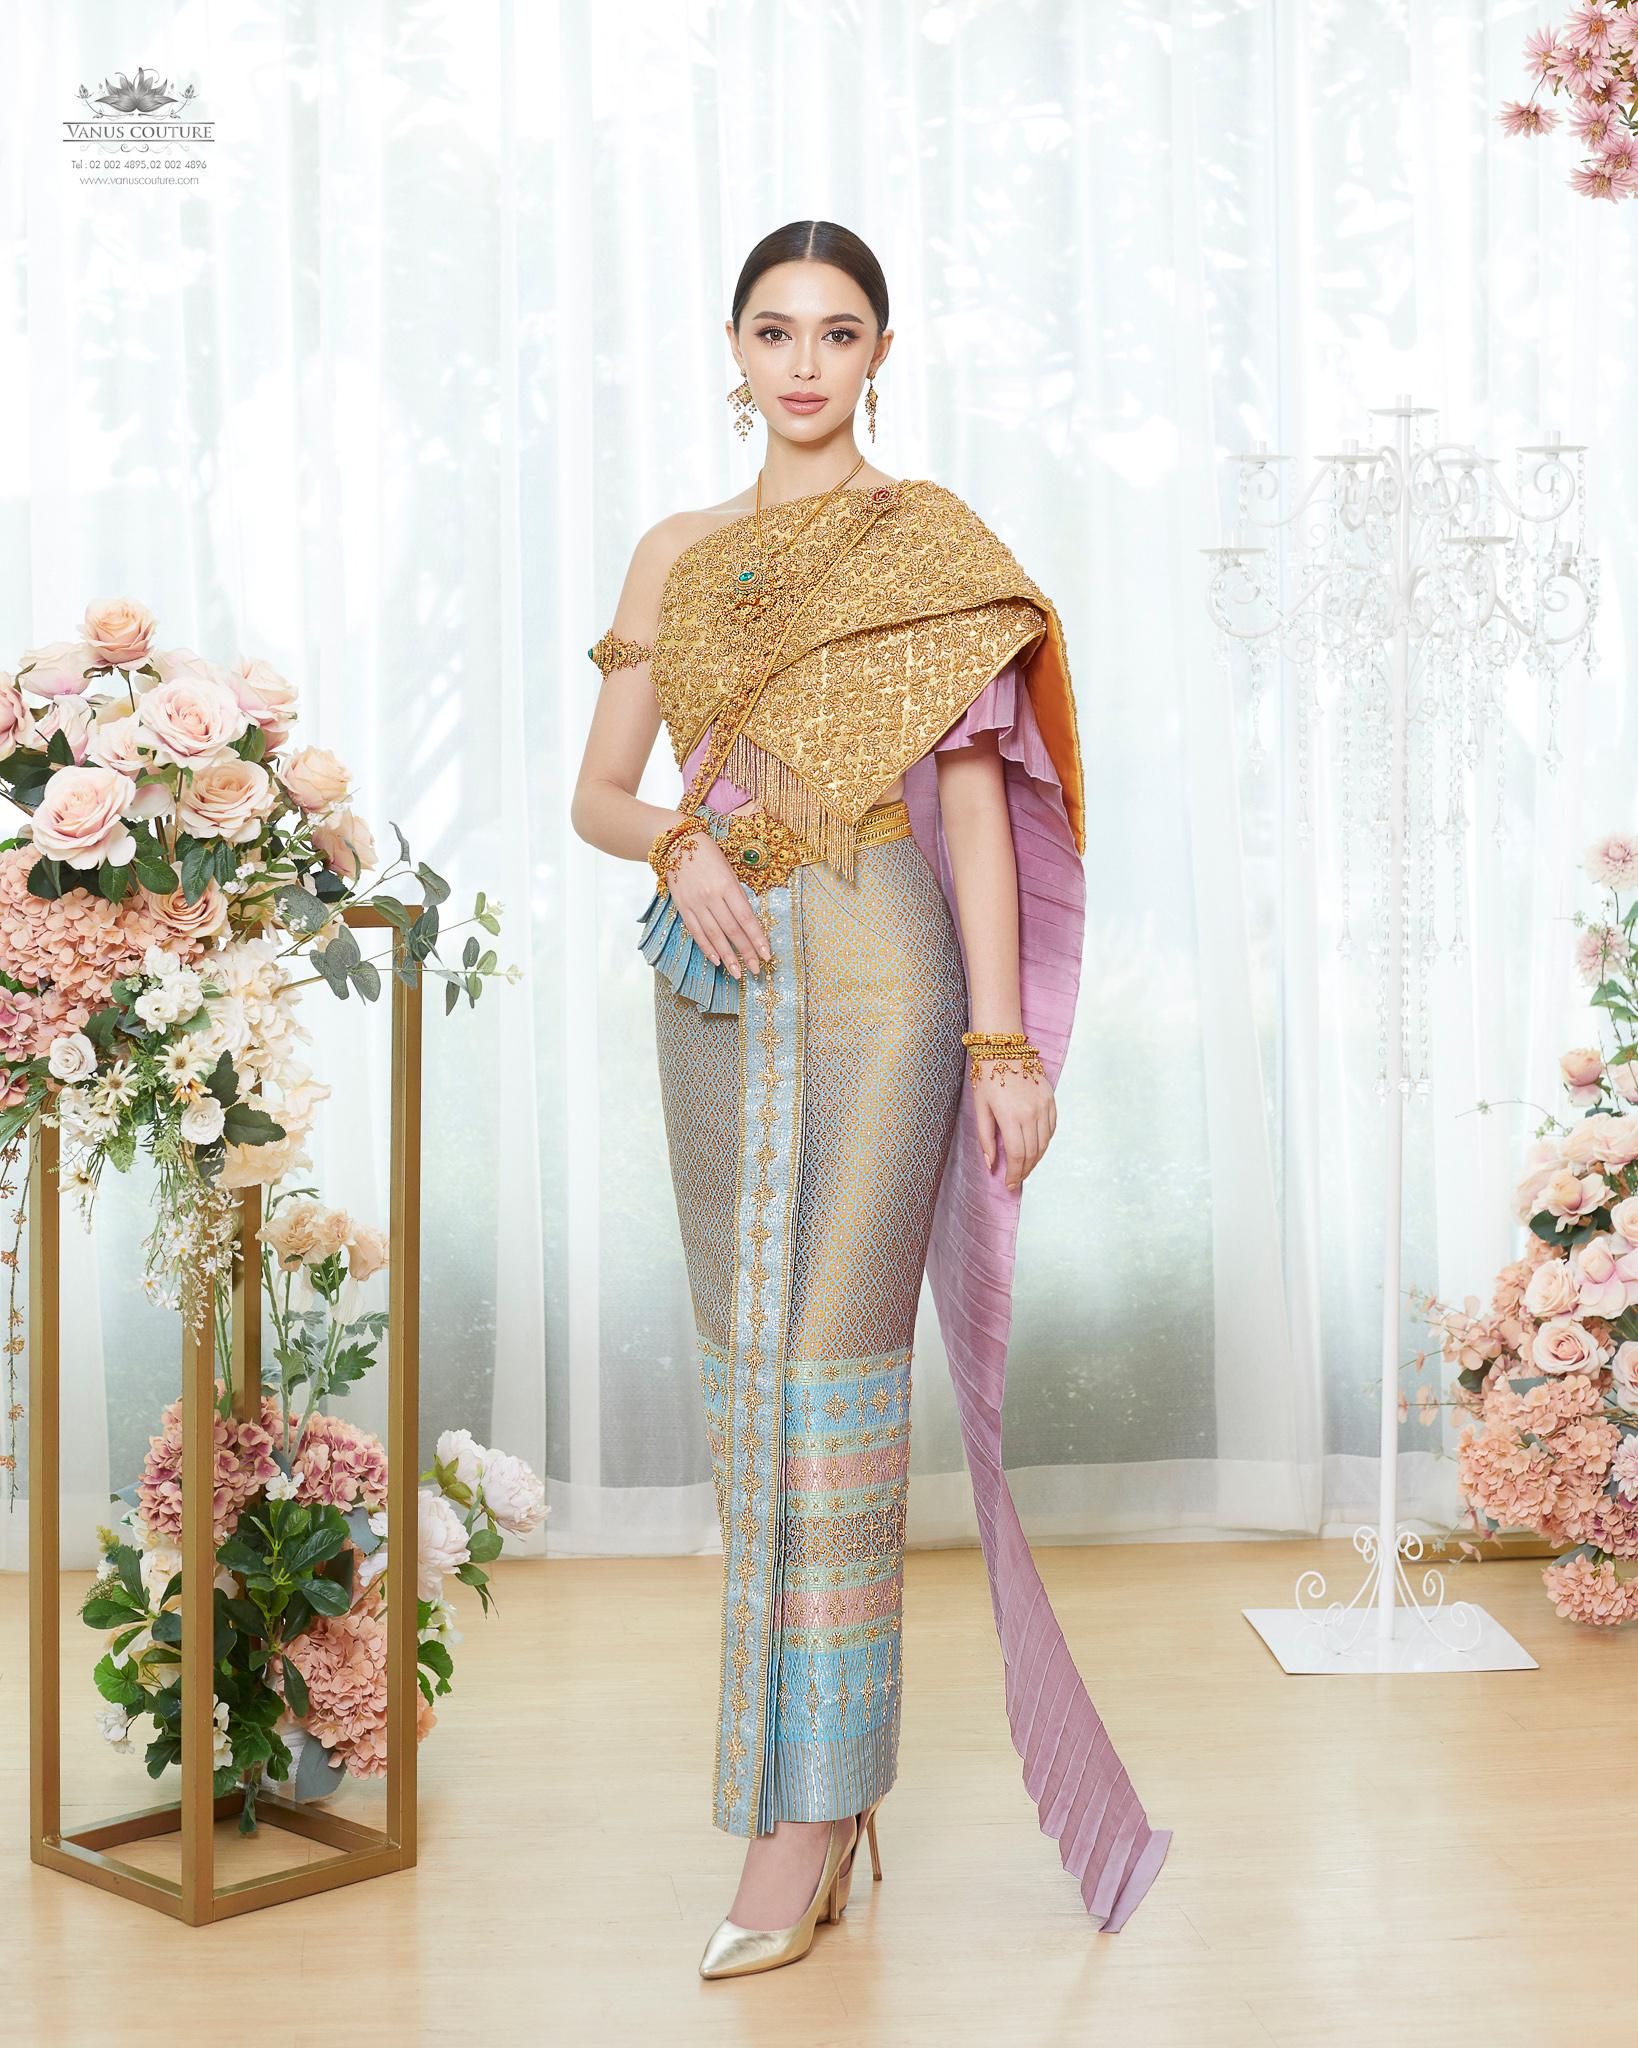 Thai traditional dress - Patricia 02